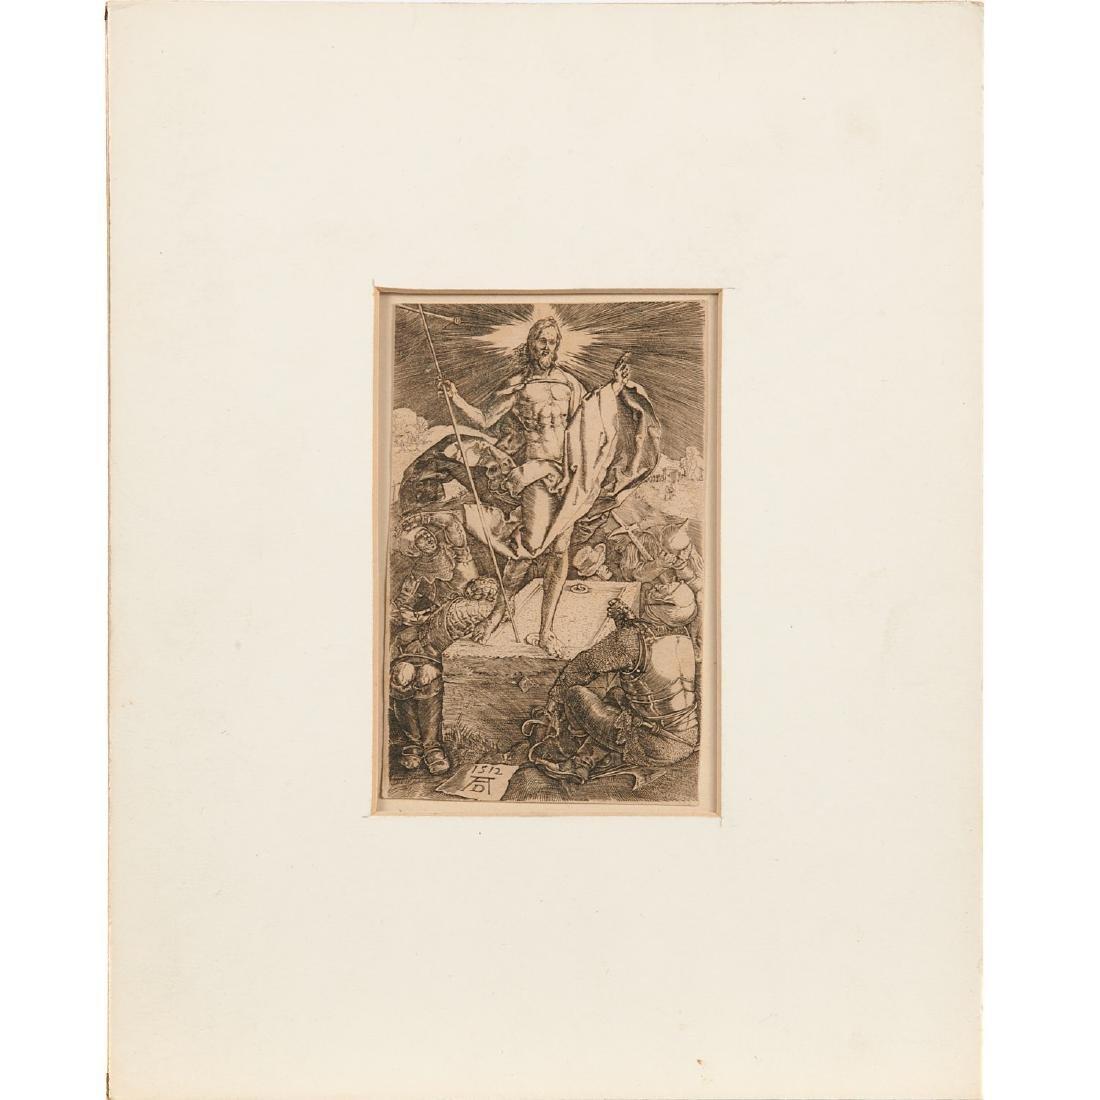 Albrecht Durer, engraving